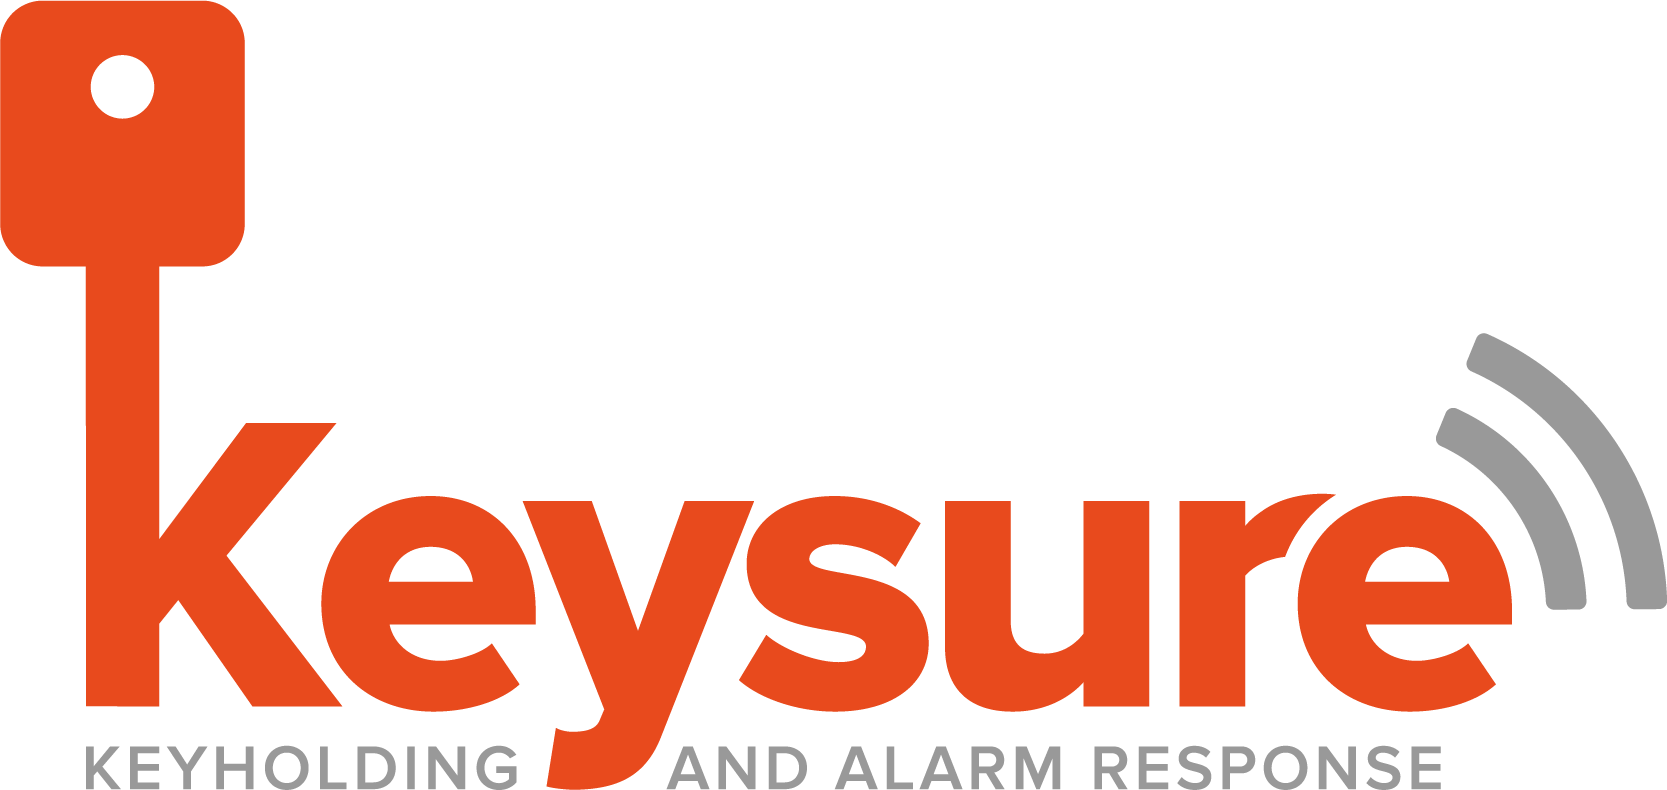 Keysure Keyholding and Alarm Response Company